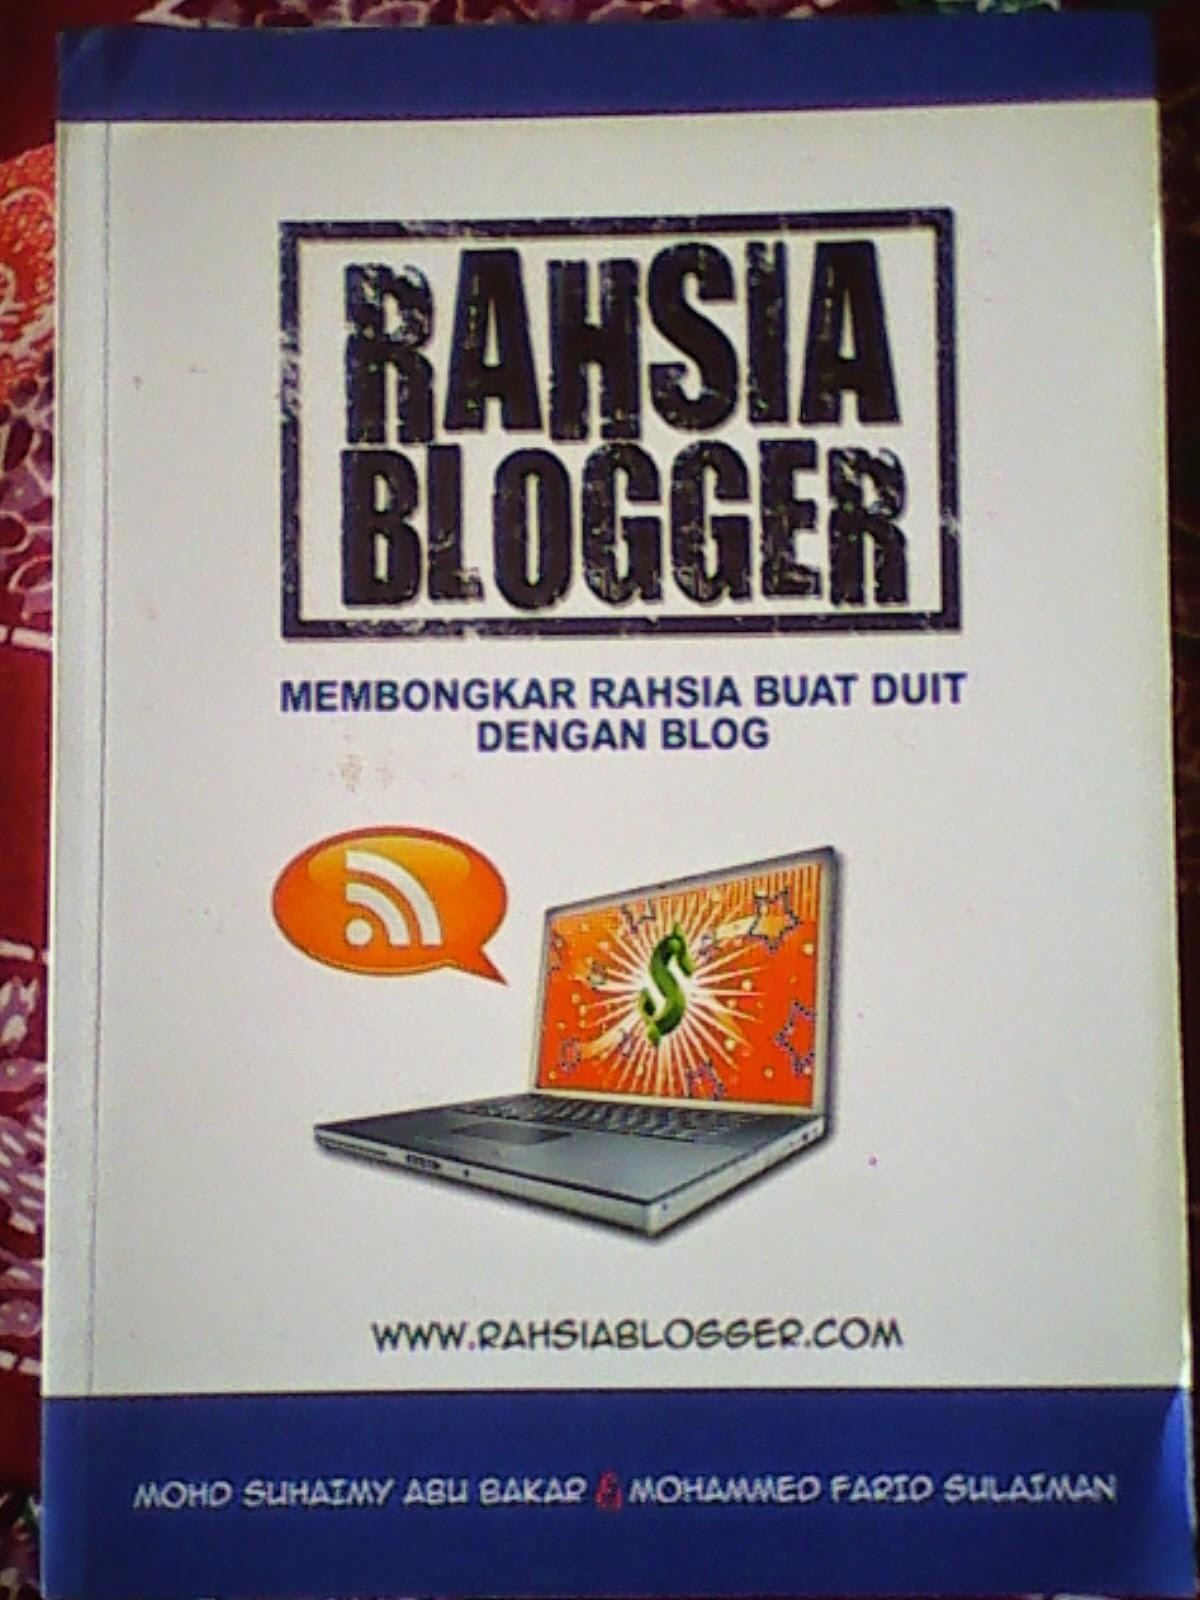 pencinta blog